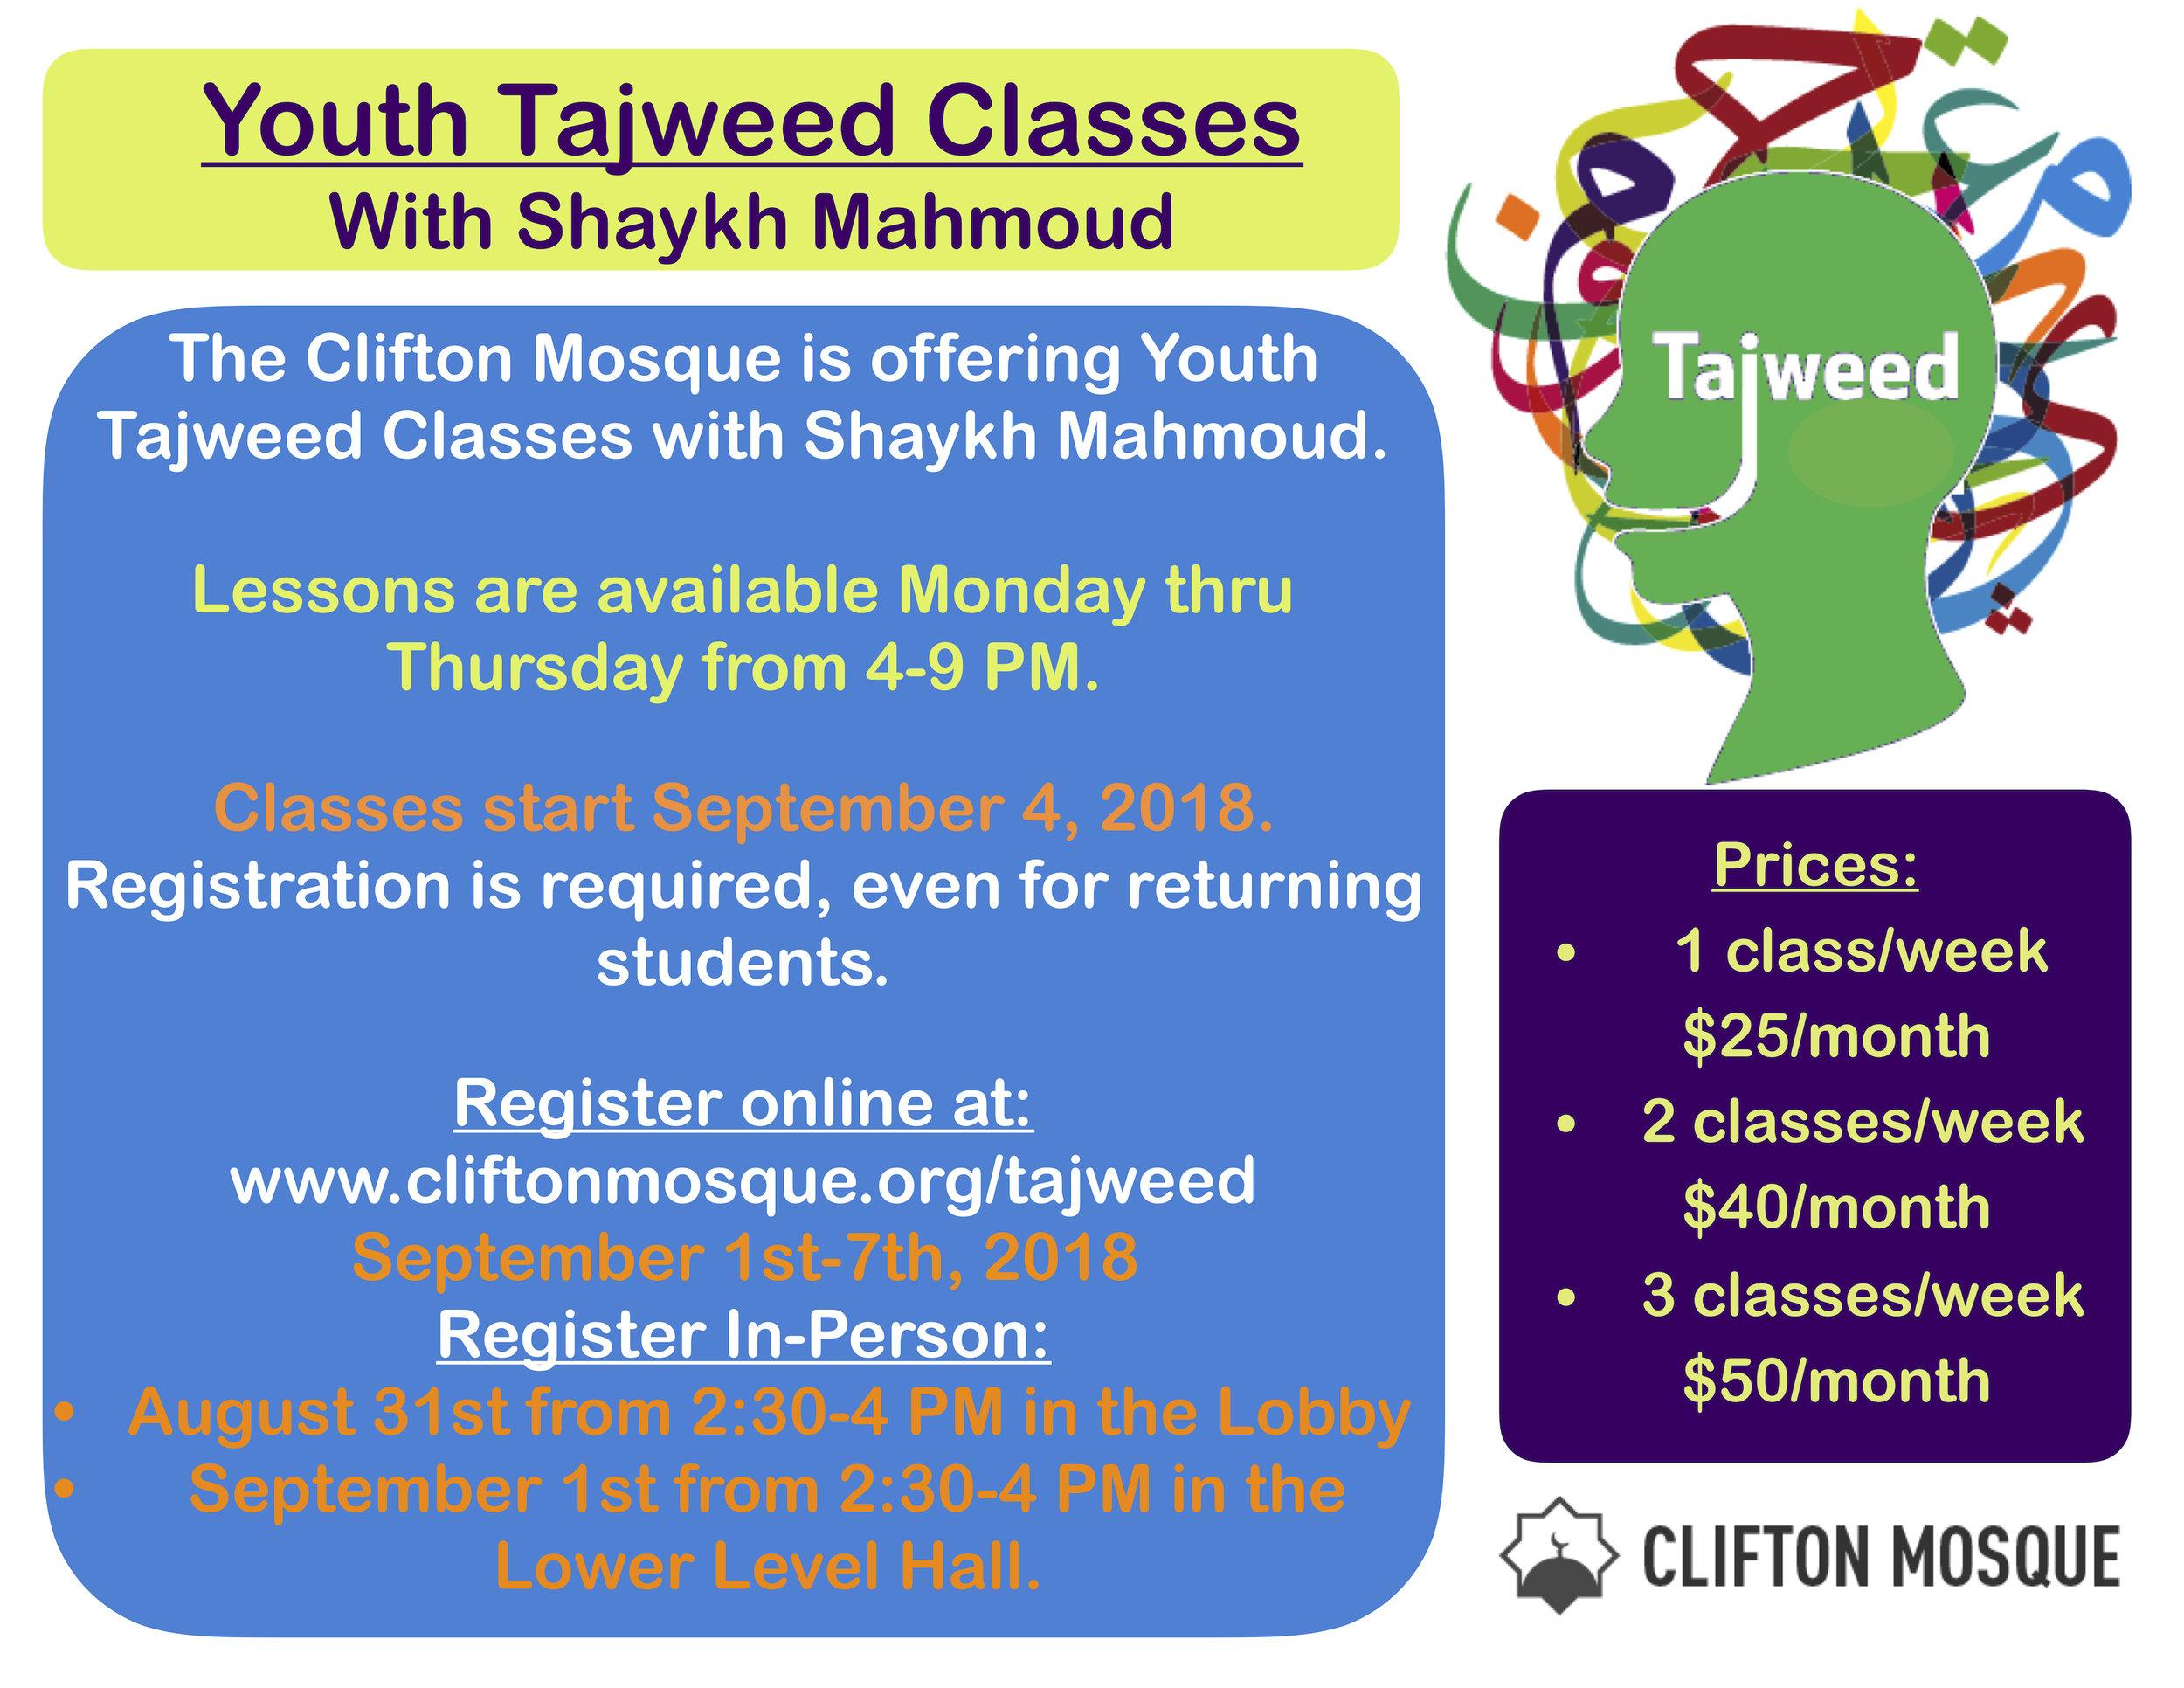 youth tajweed18j.jpg